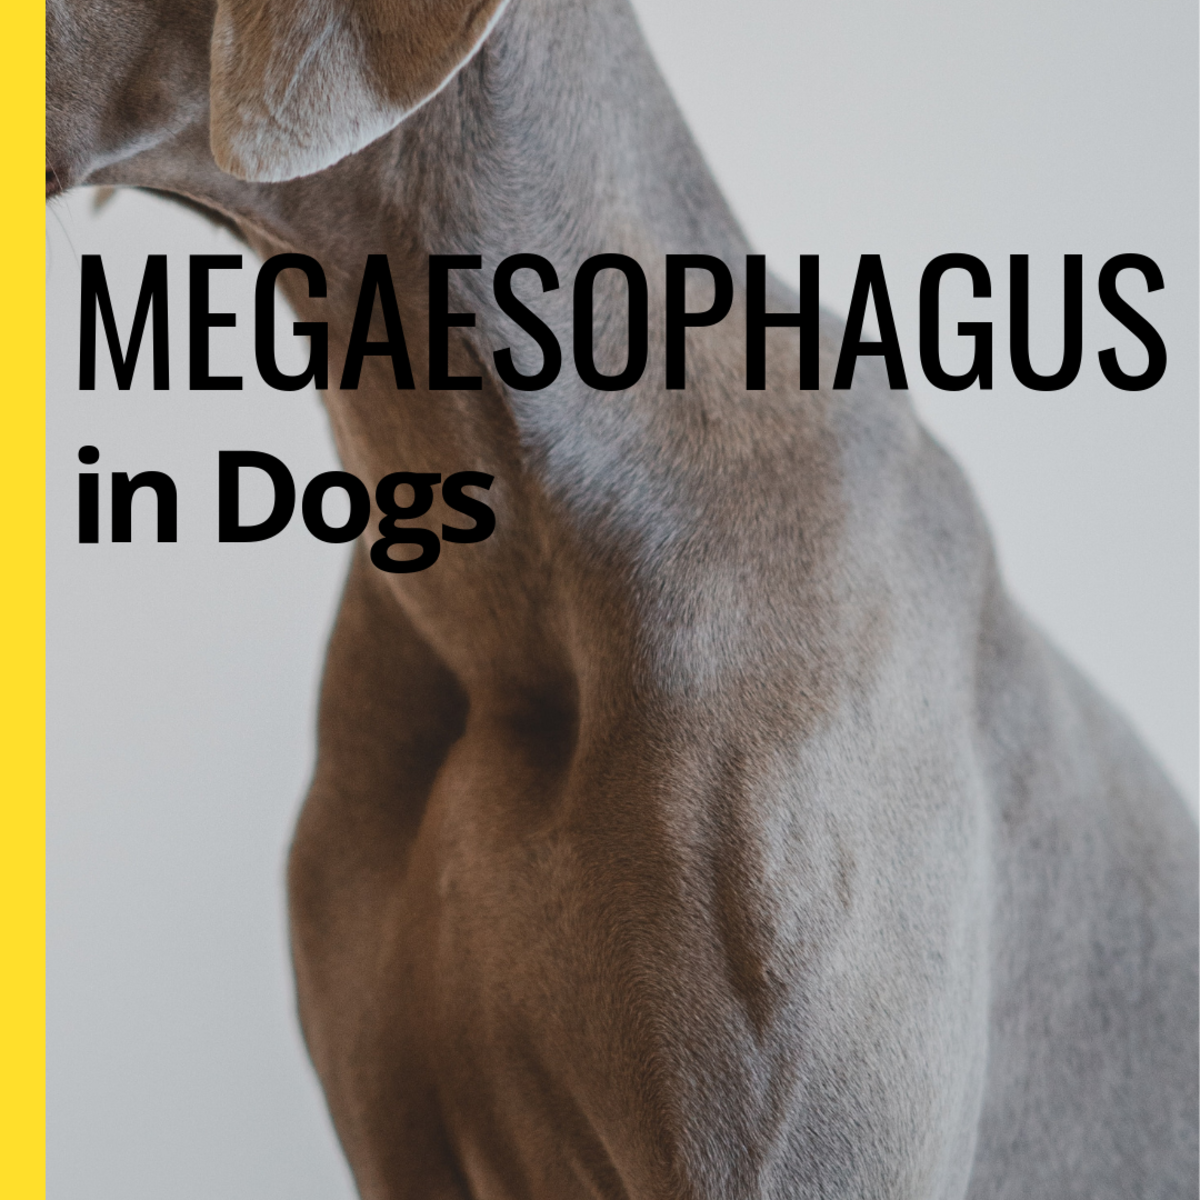 Managing Megaesophagus in Dogs